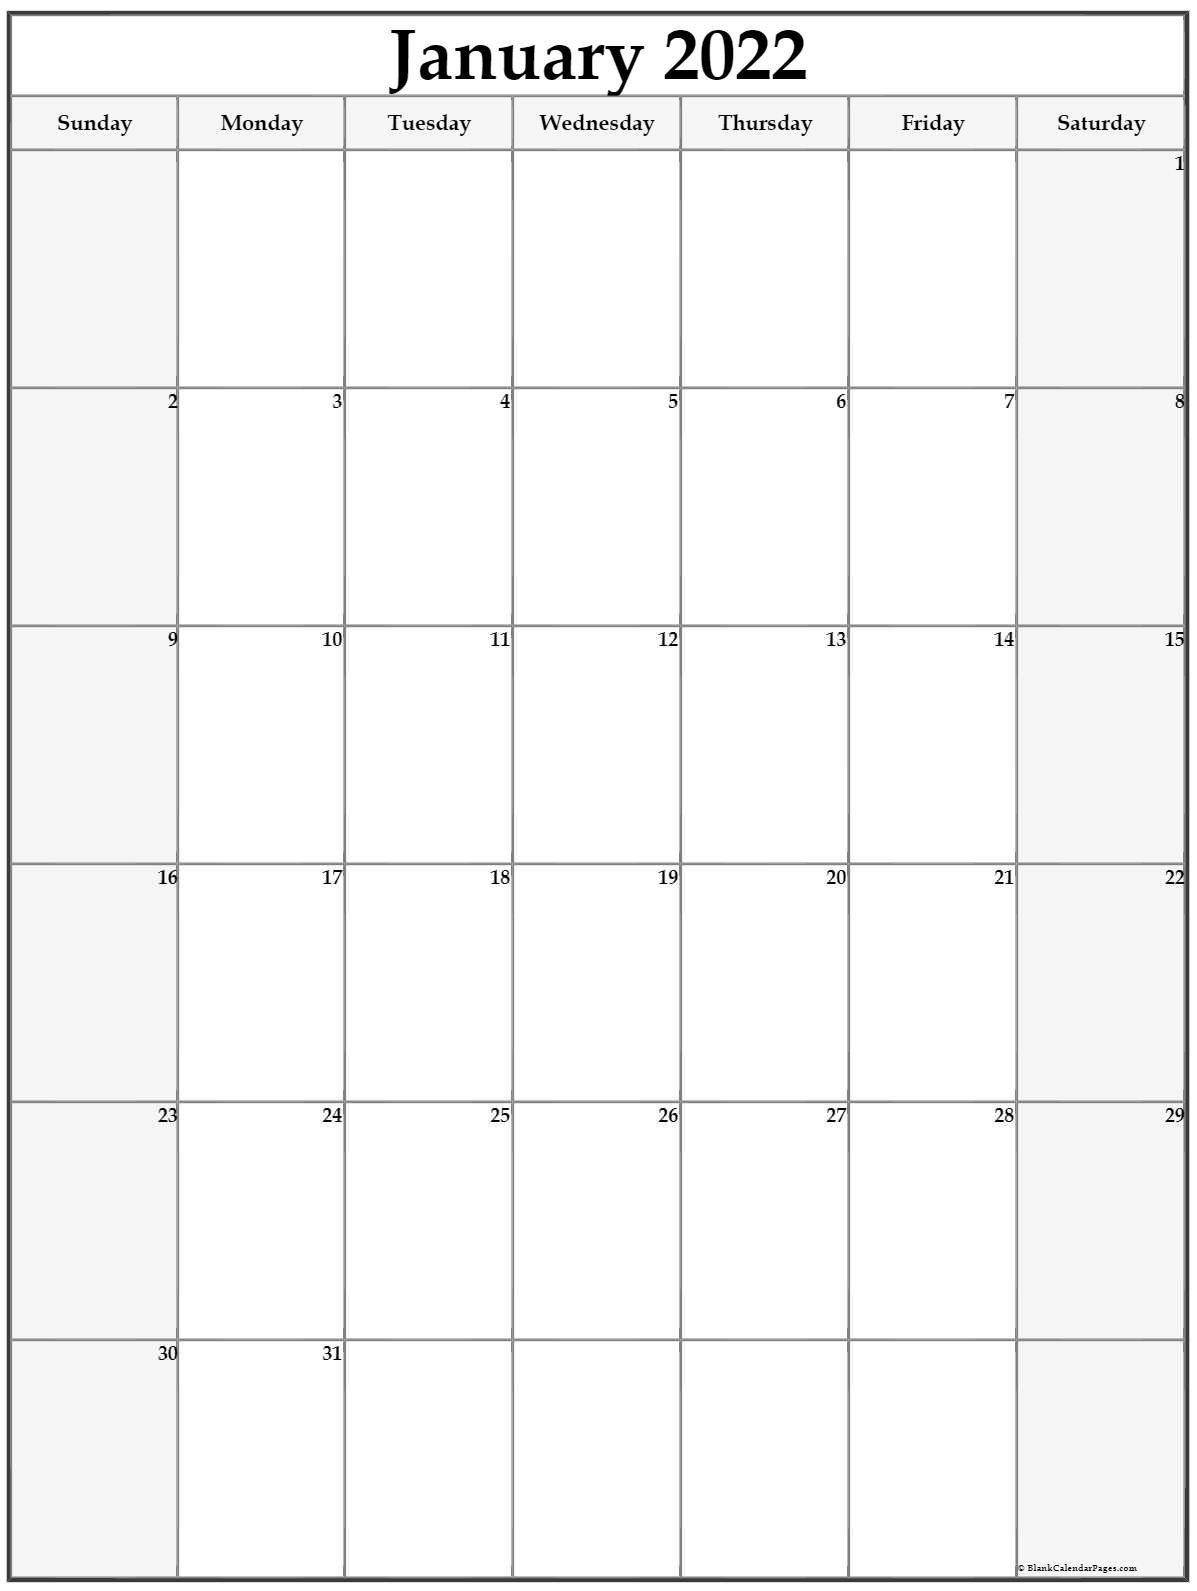 January 2022 Vertical Calendar   Portrait regarding January 2022 Calendar Half Page Print Photo